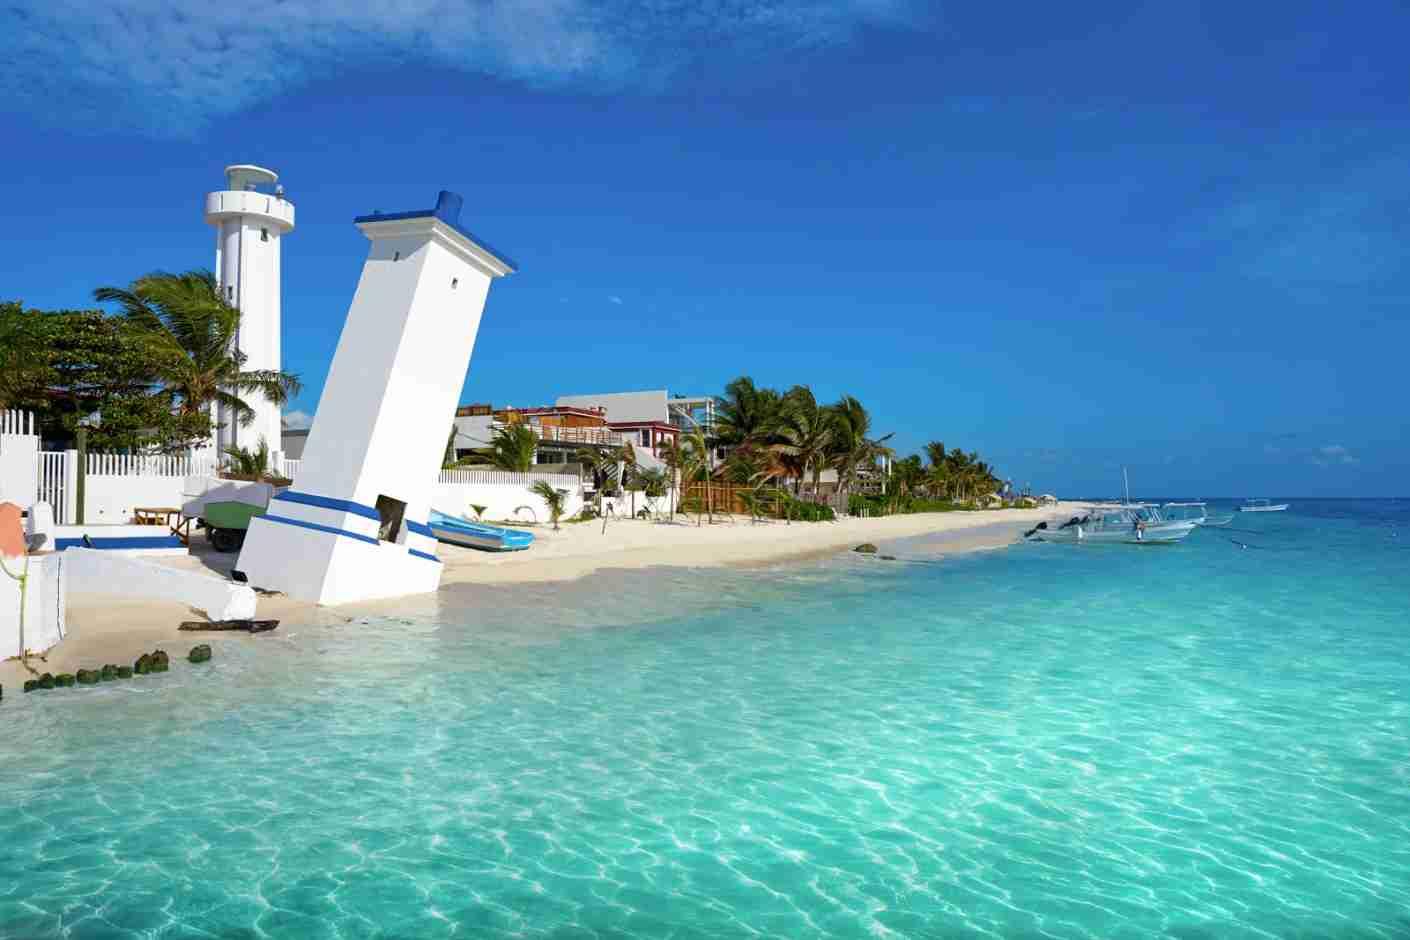 Puerto Morelos. (Photo via Shutterstock)